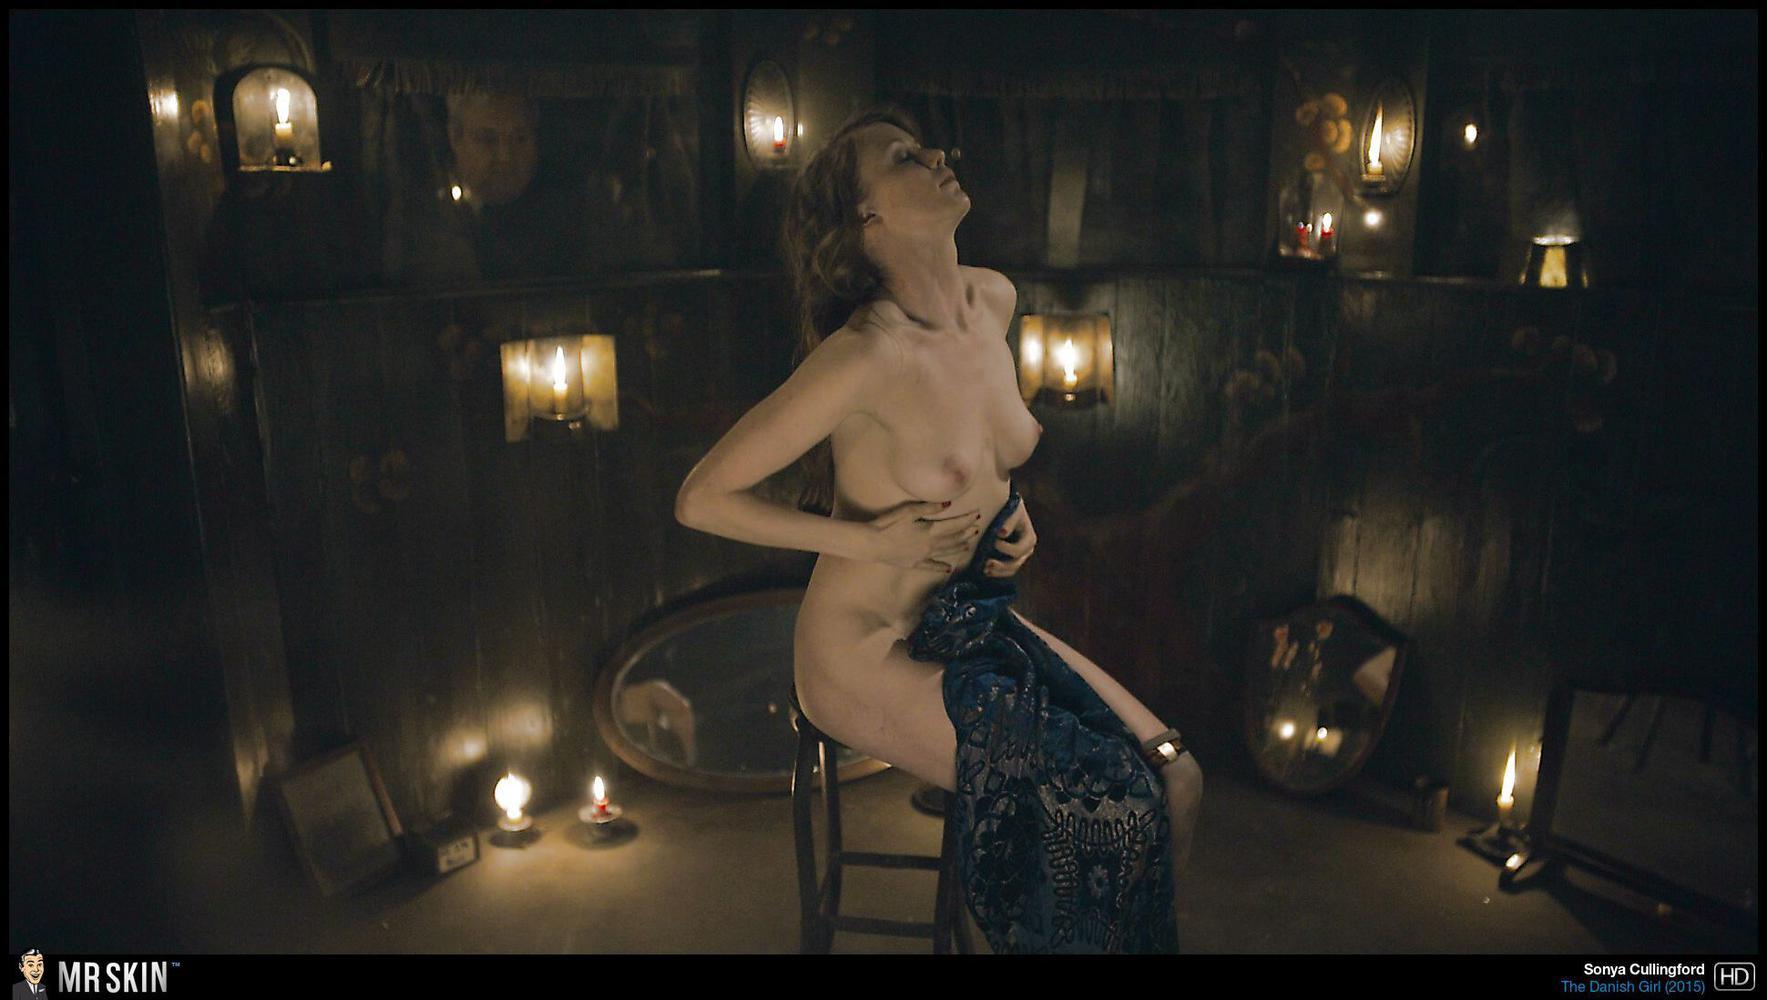 Estuvo Clip movie naked woman girls